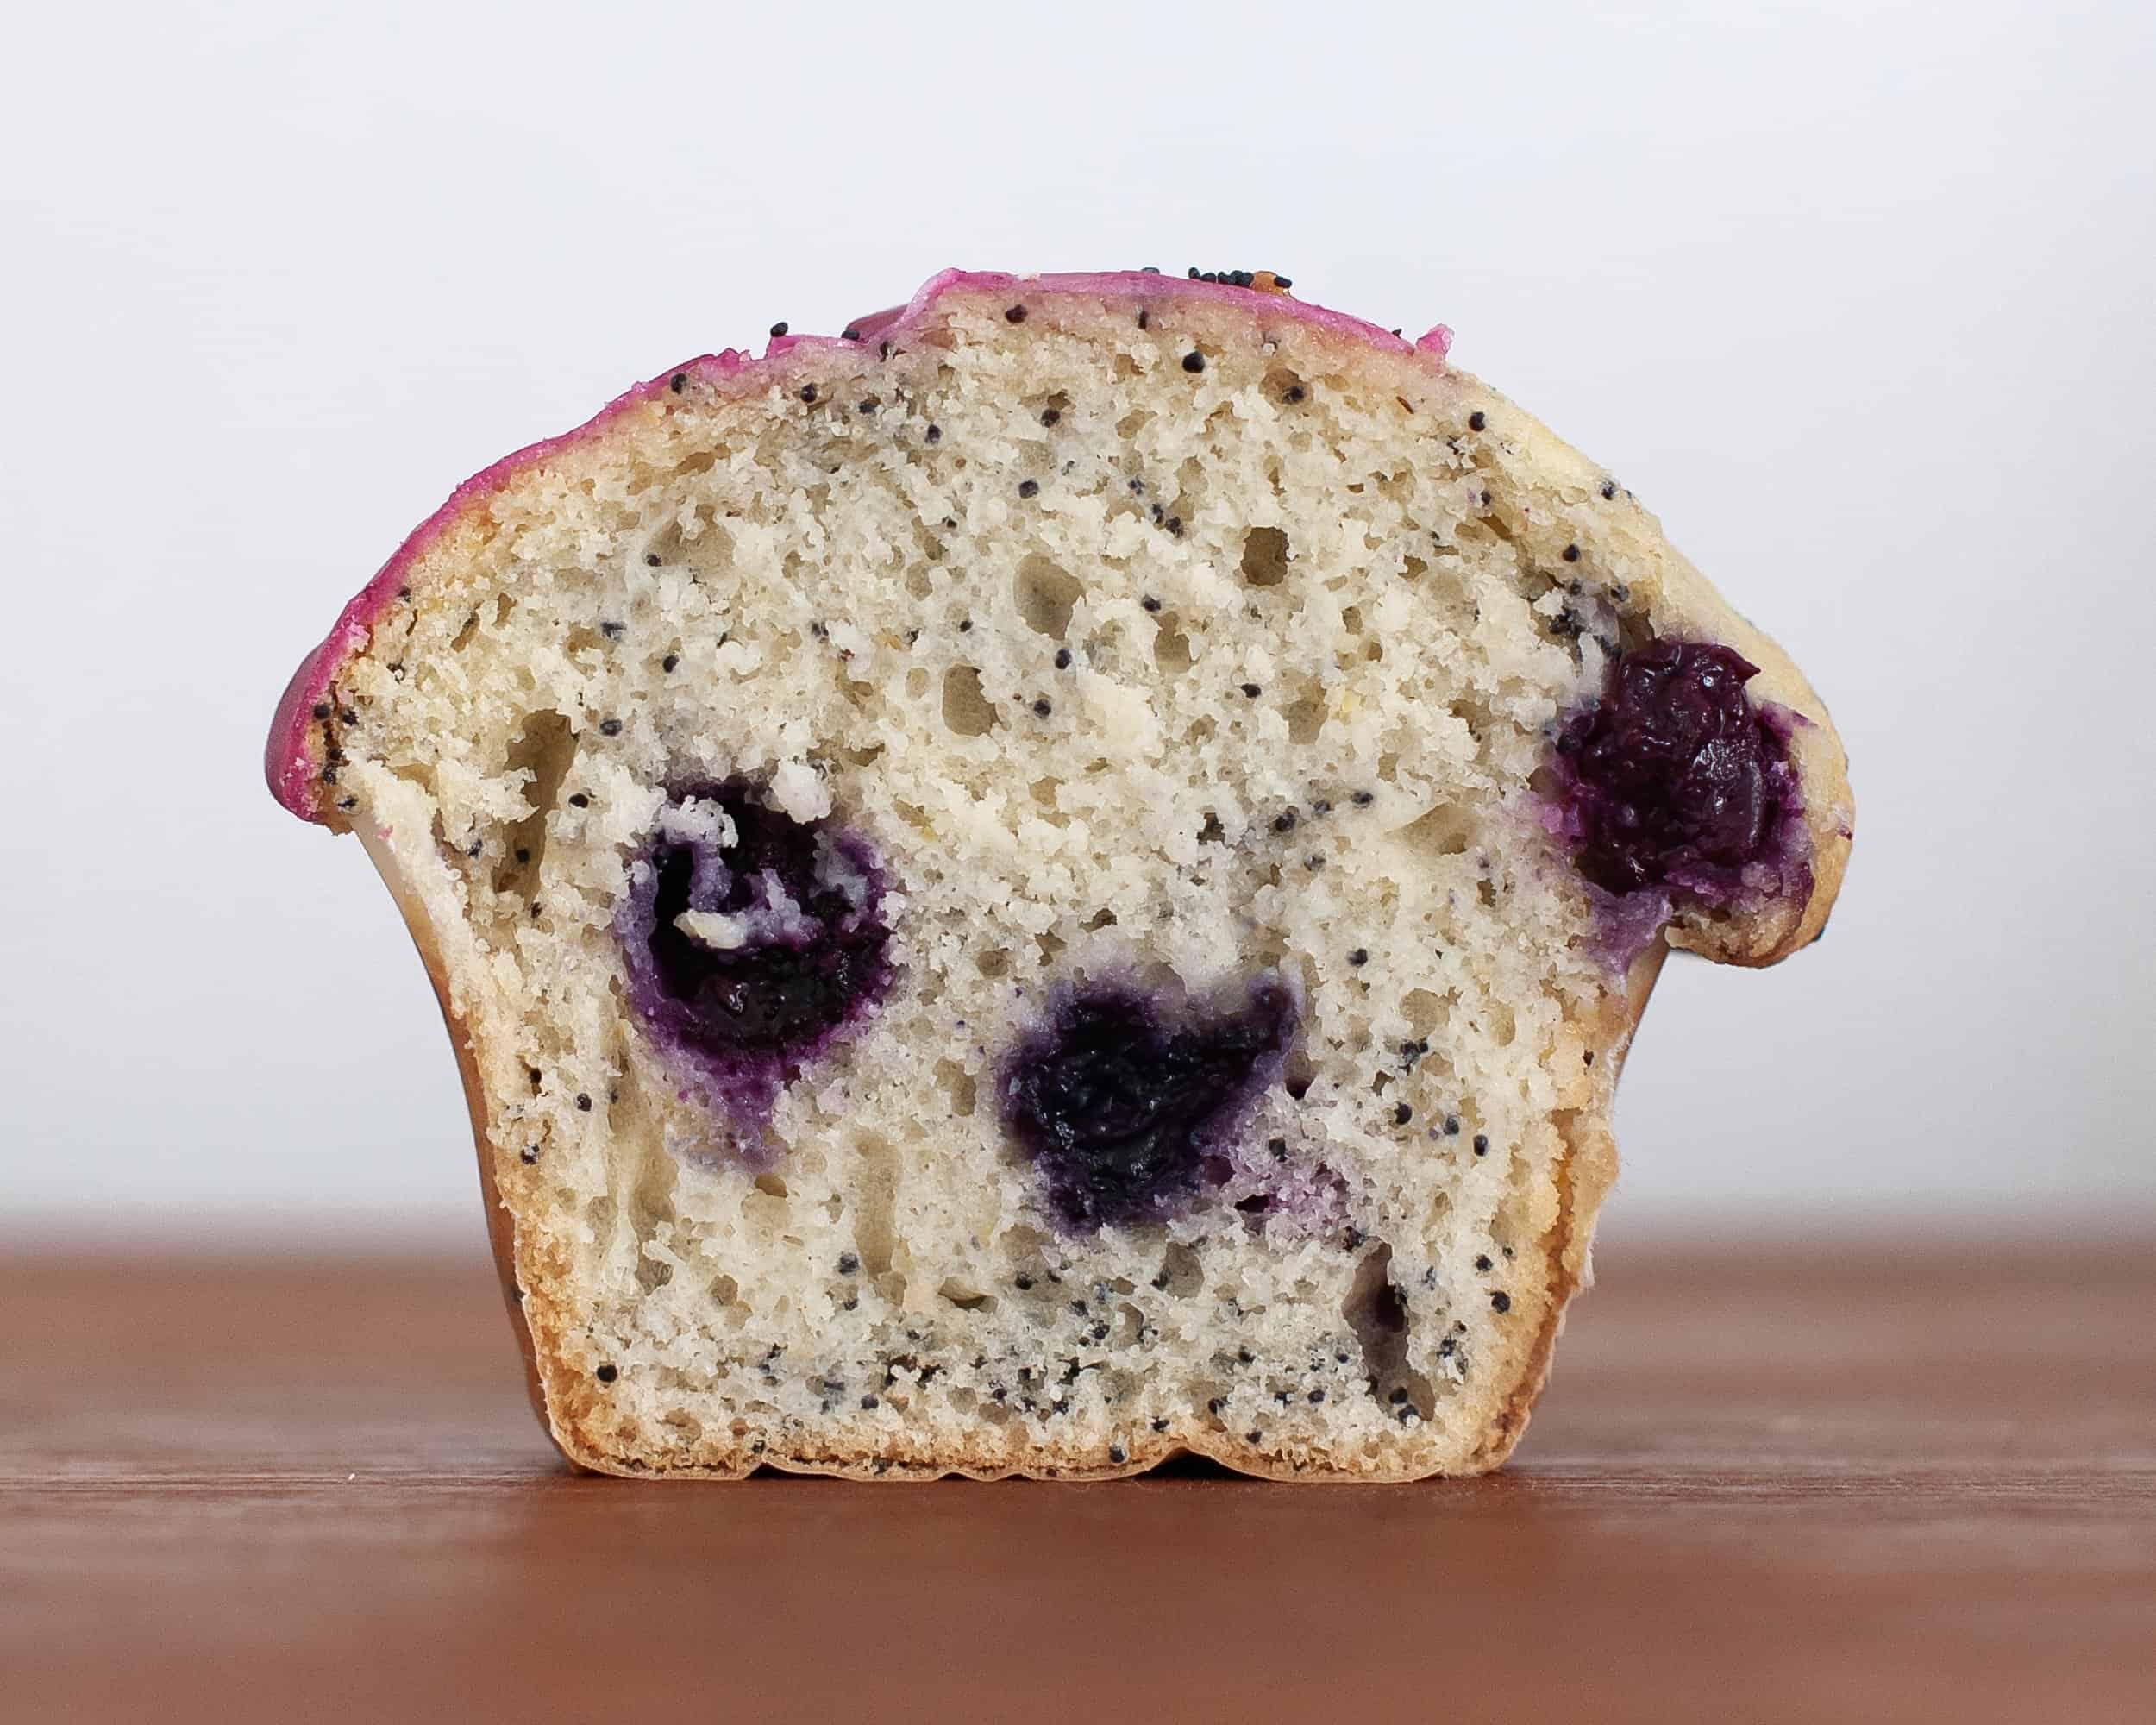 Lemon, Poppy Seed and Blueberry Glazed Muffins